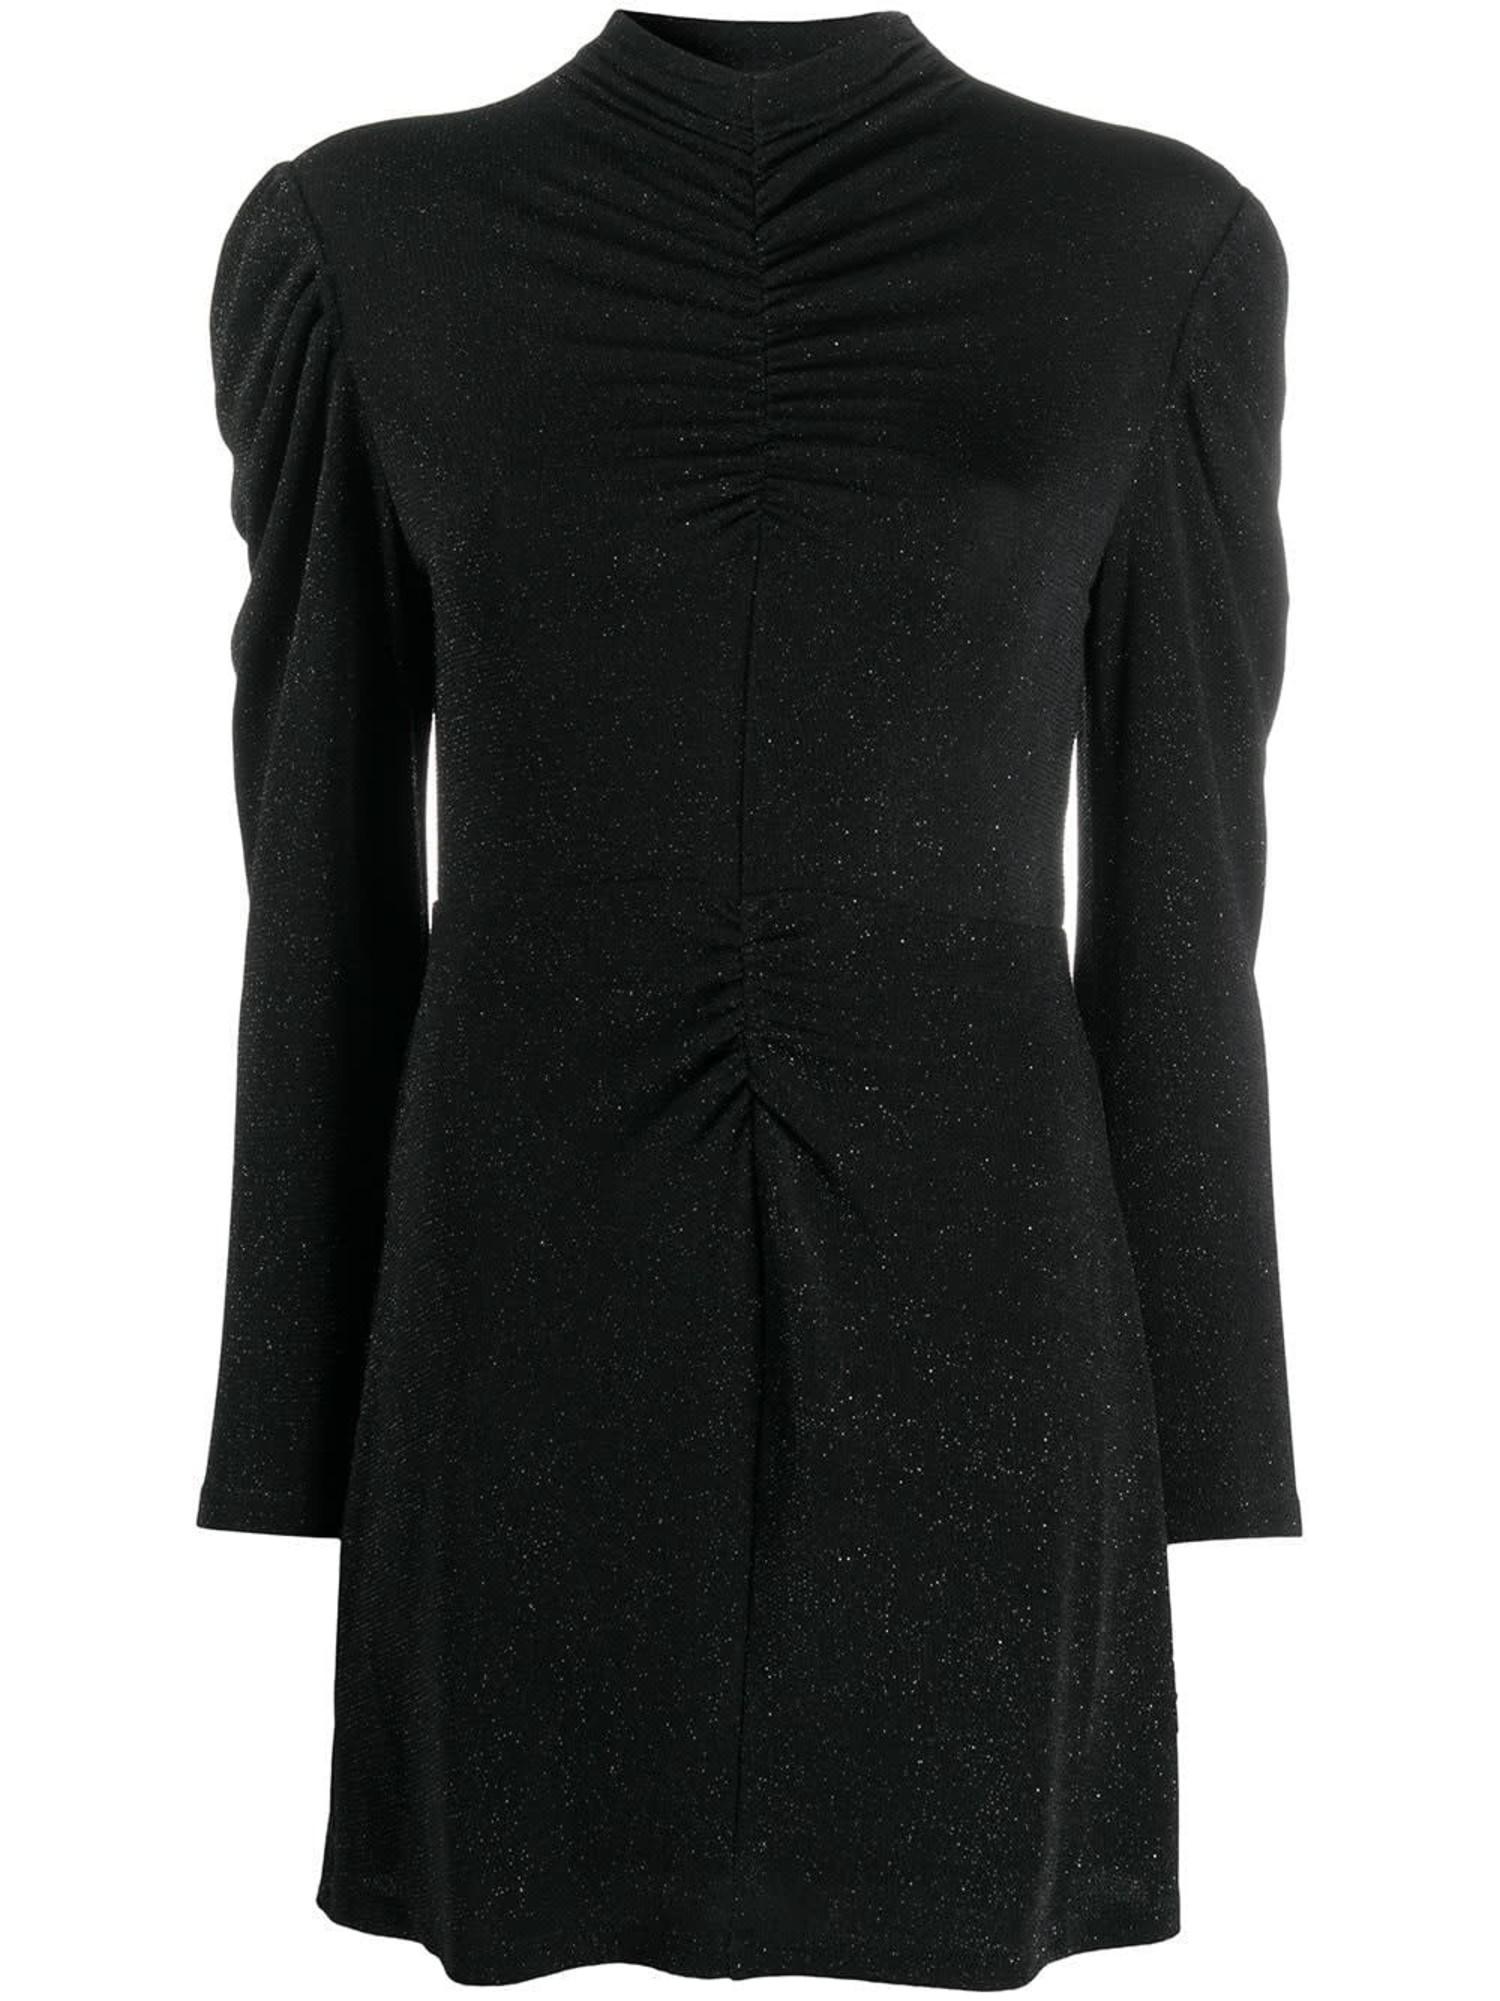 Iro Hasti Dress Billie Boutique